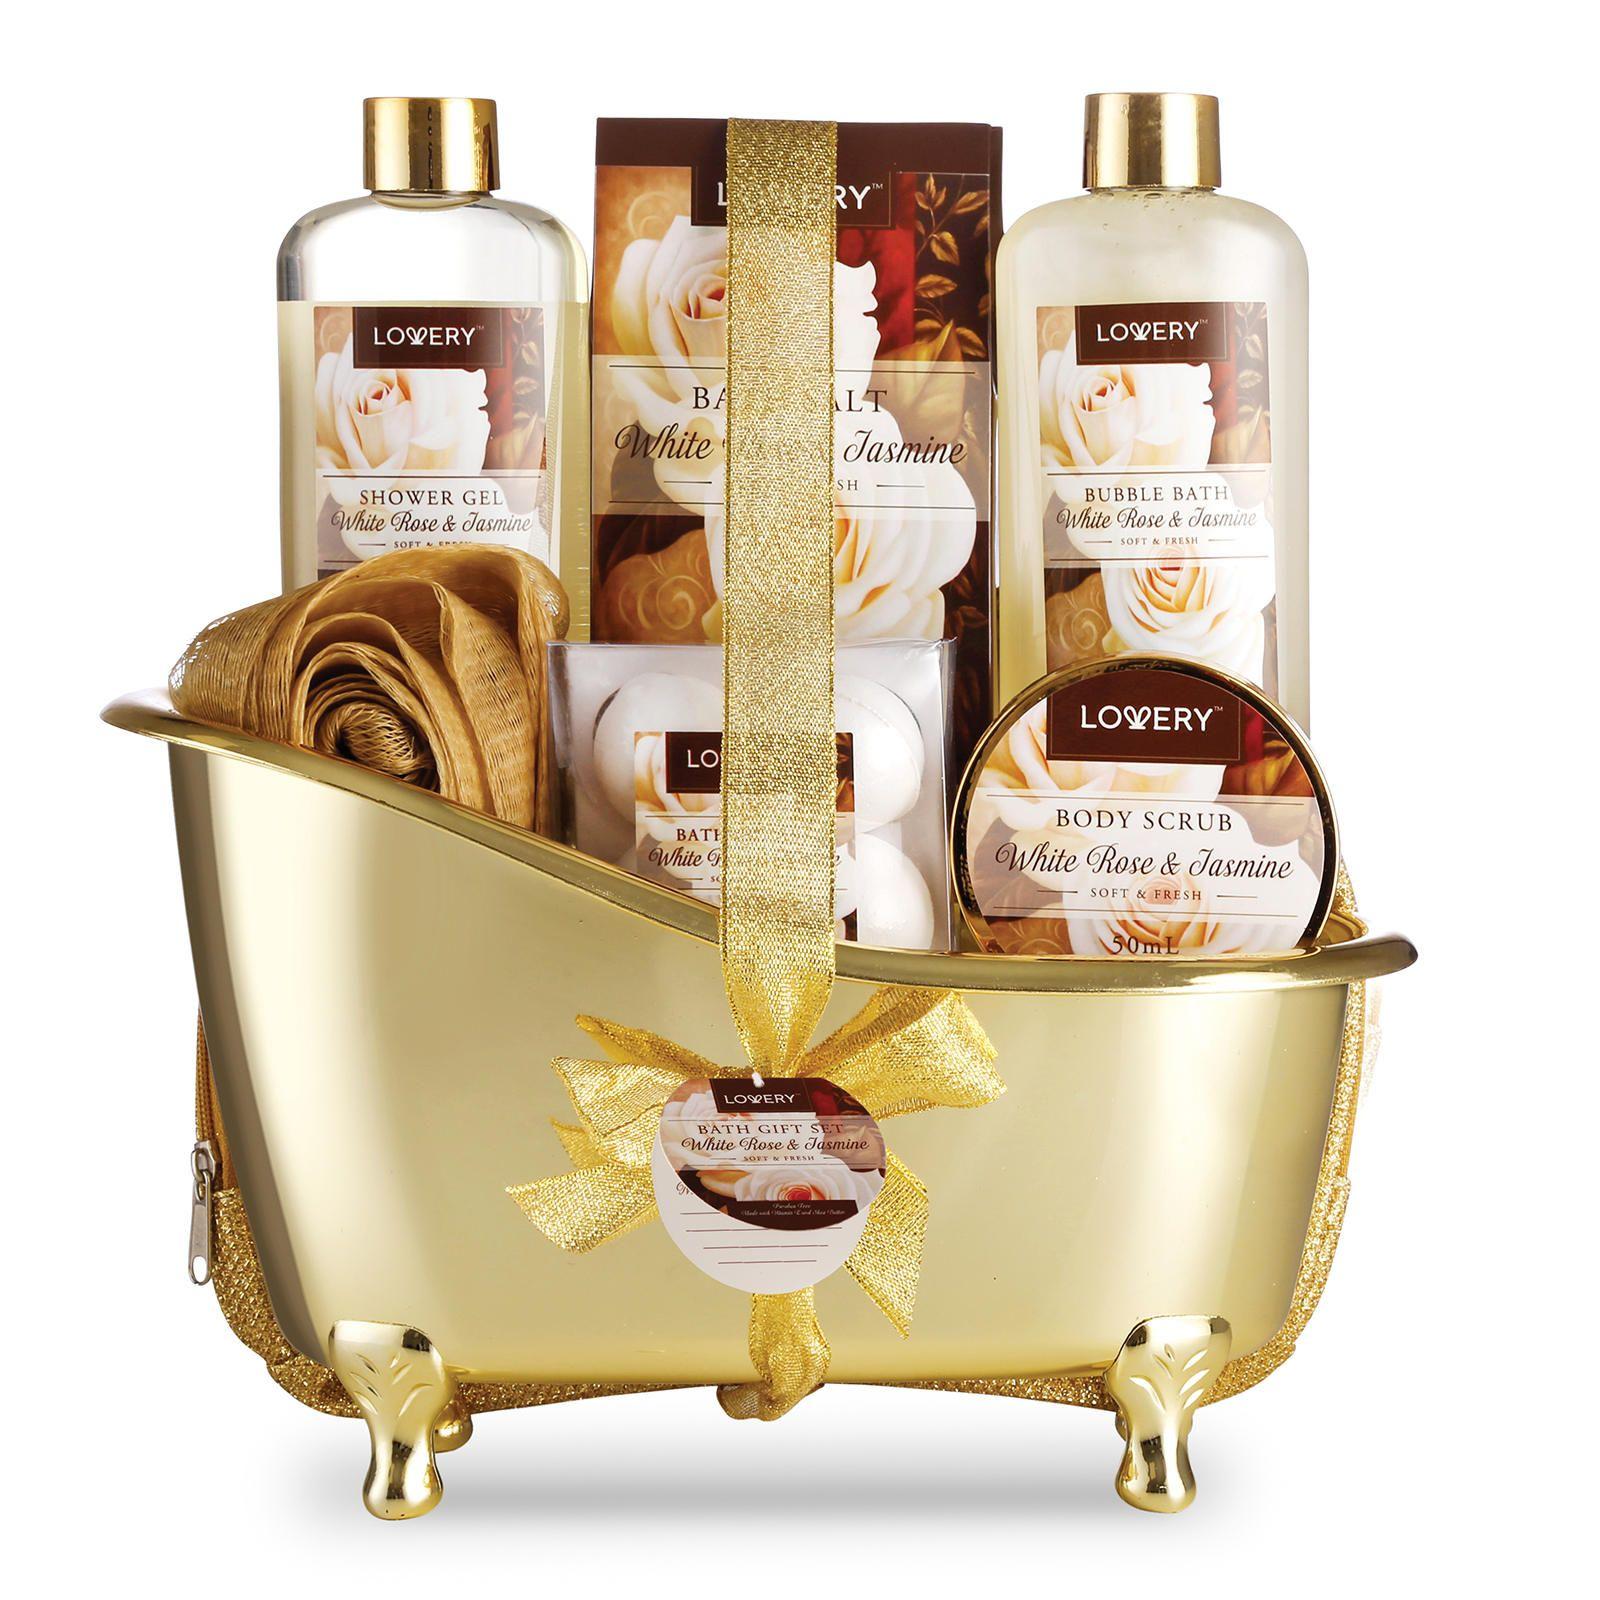 Home Spa Gift Basket - Luxurious 8 Piece Bath & Body Set For Women ...